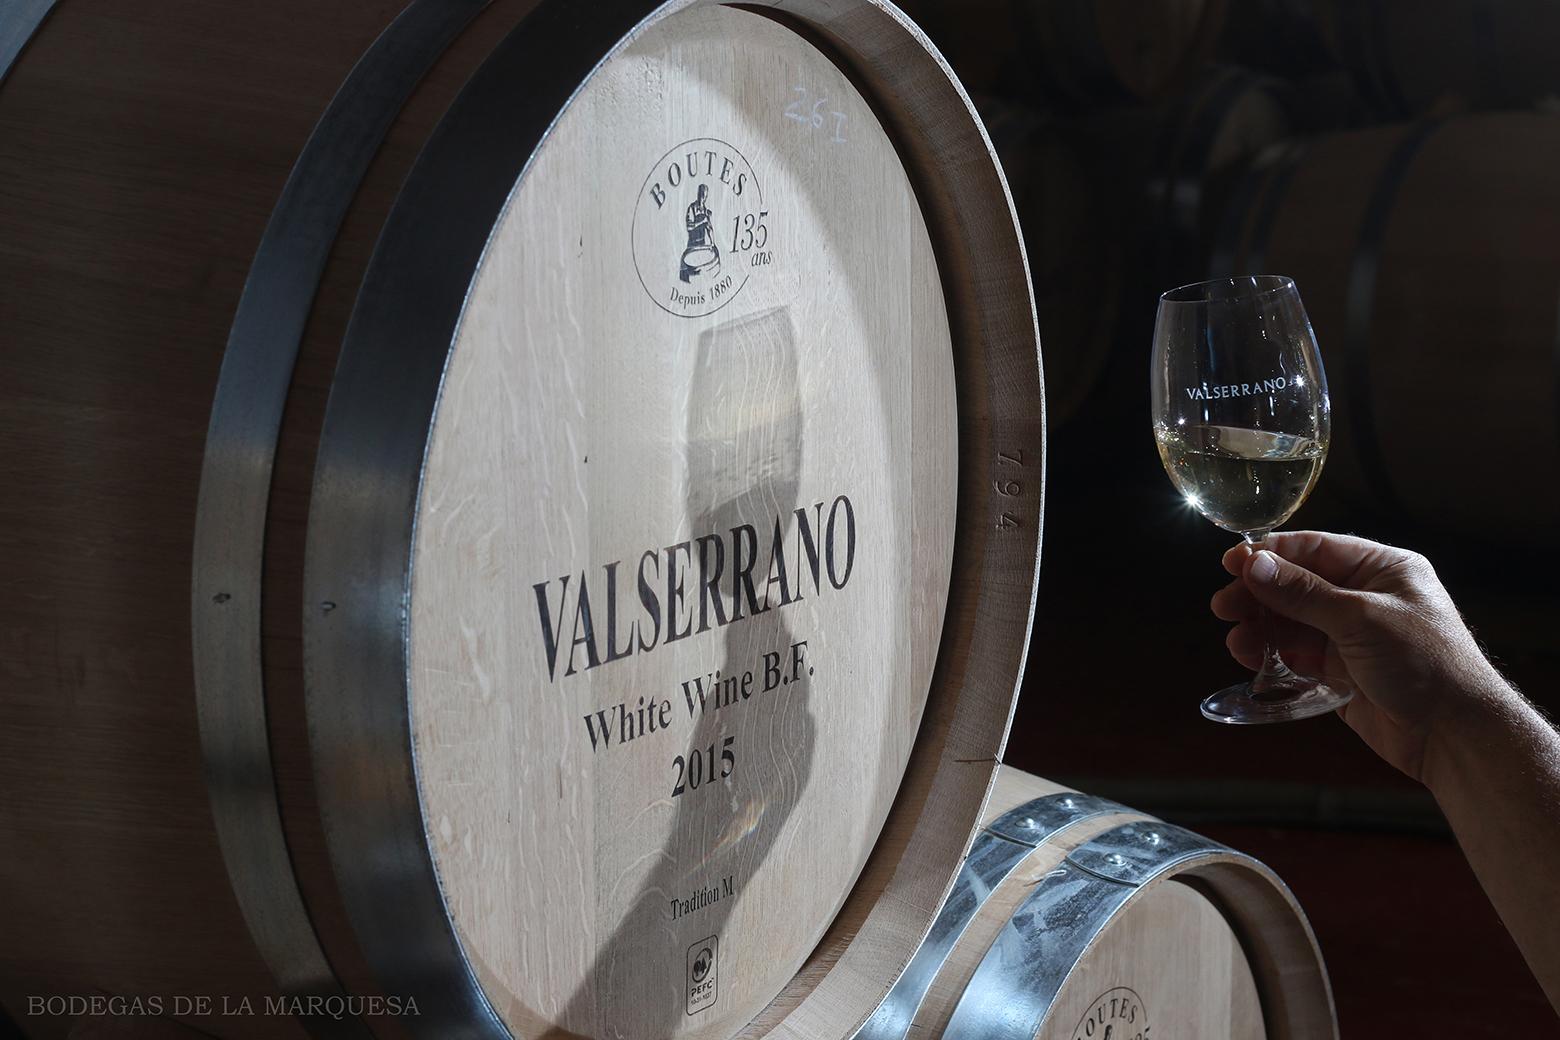 Valserrano Blanco fermentado en Barrica